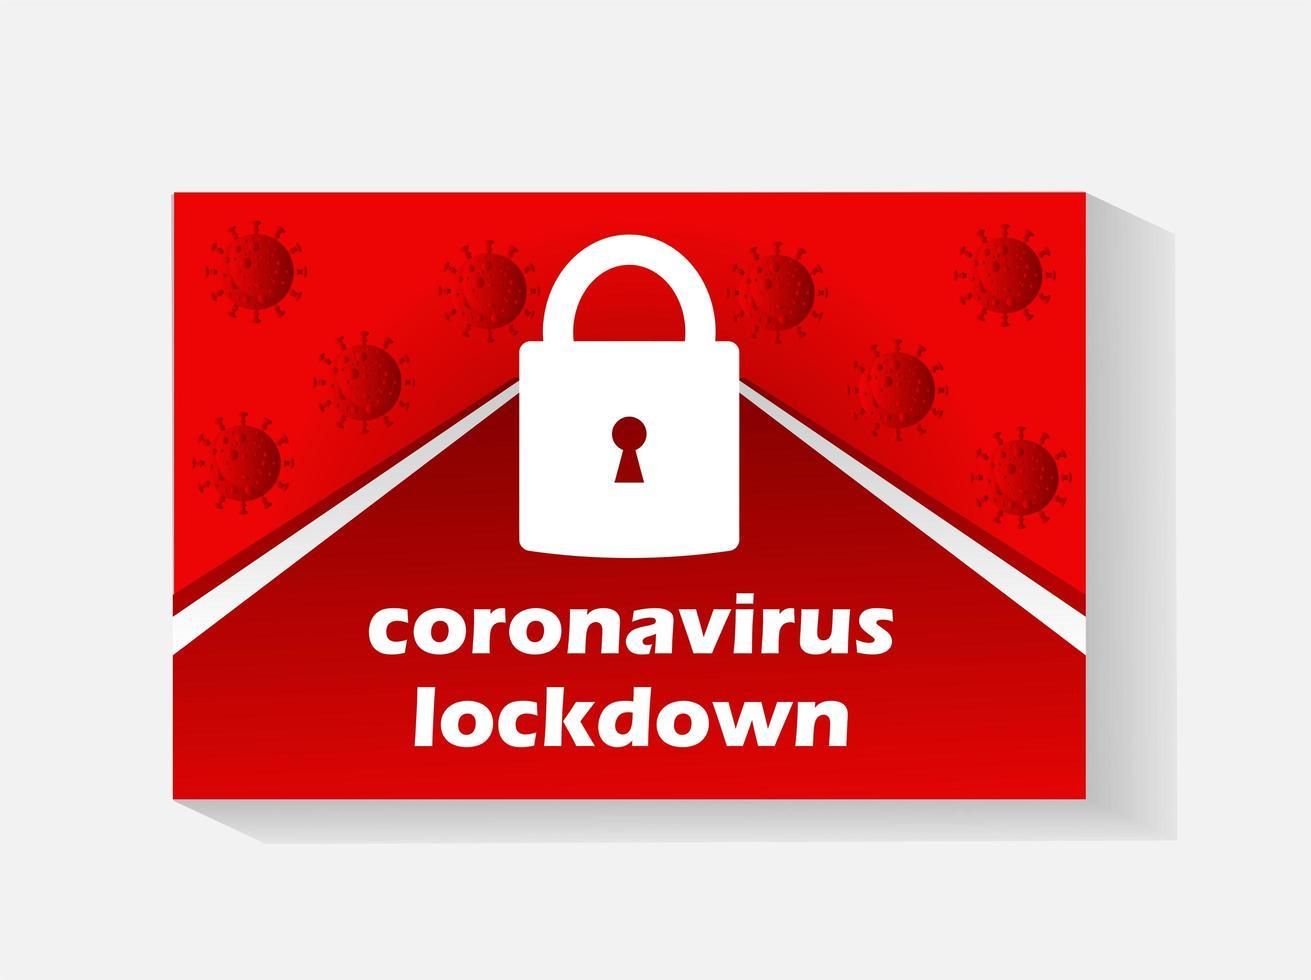 símbolo de bloqueo global de coronavirus vector